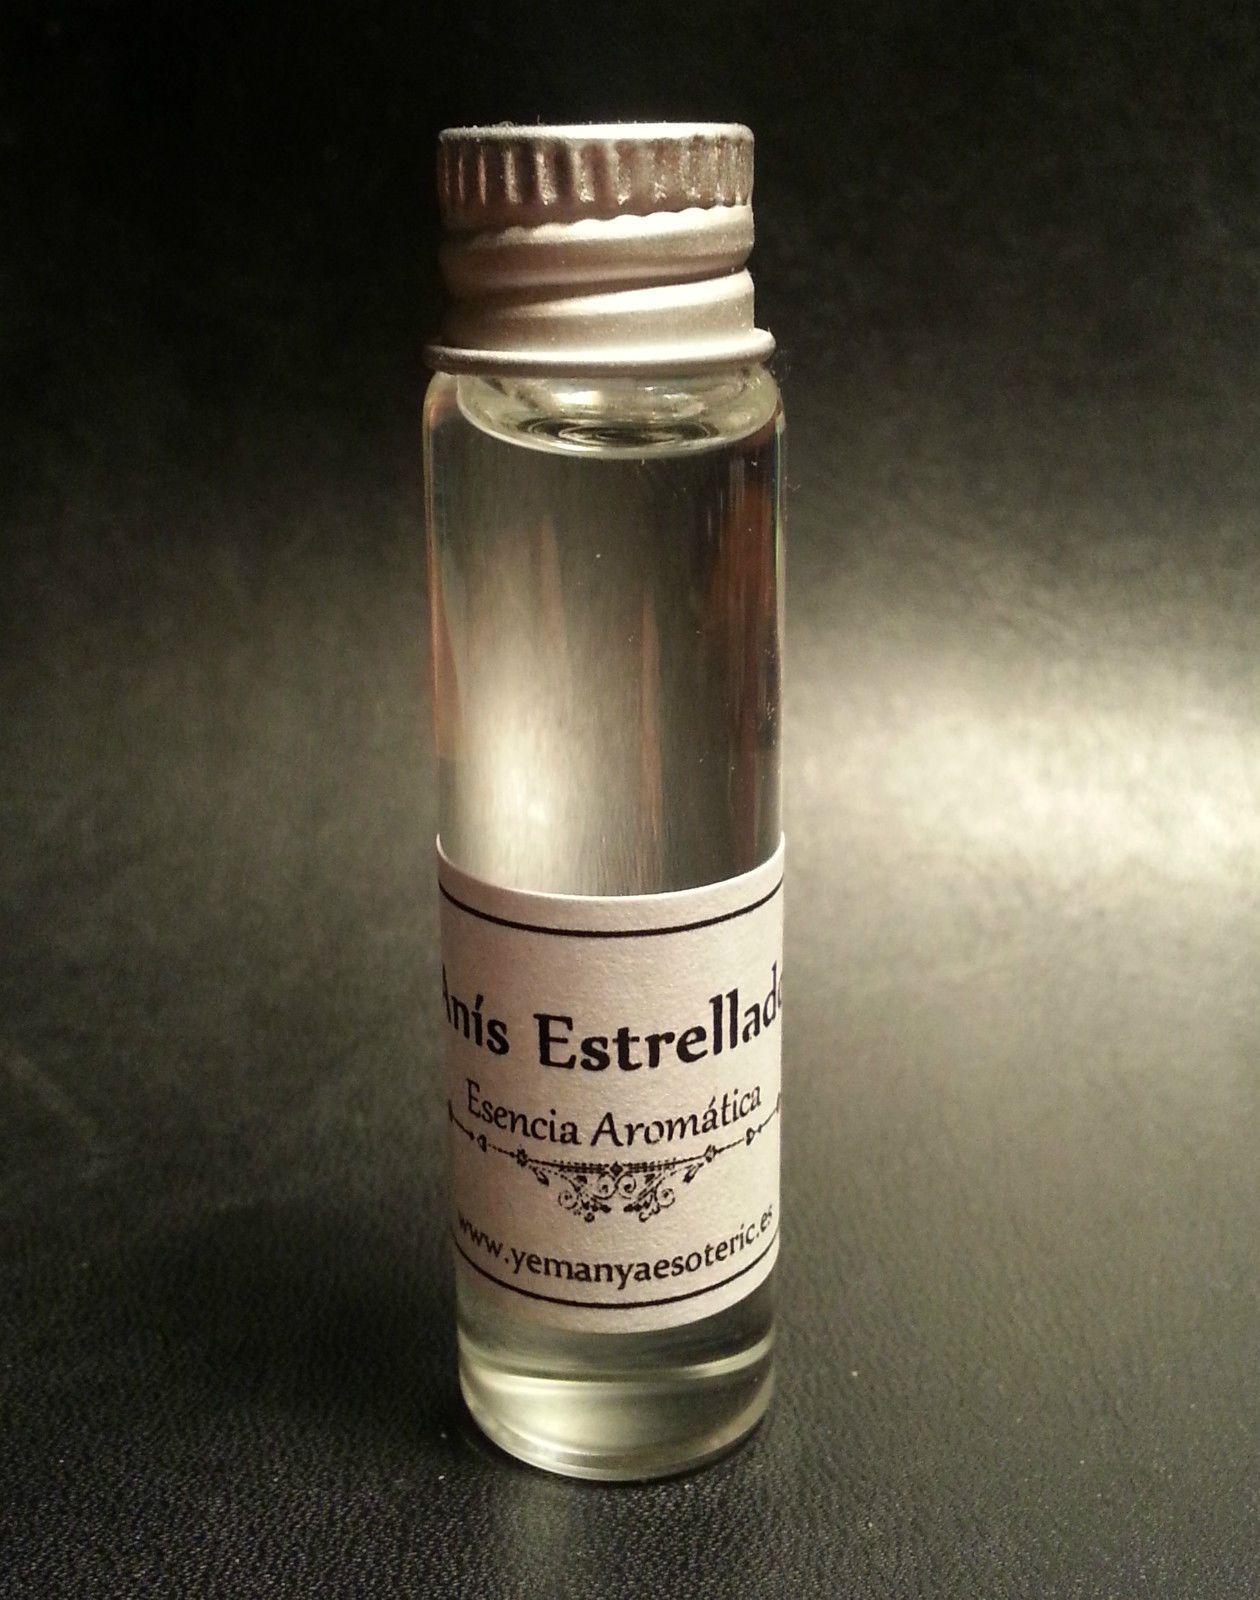 ESENCIA AROMATICA ANIS 10 ml